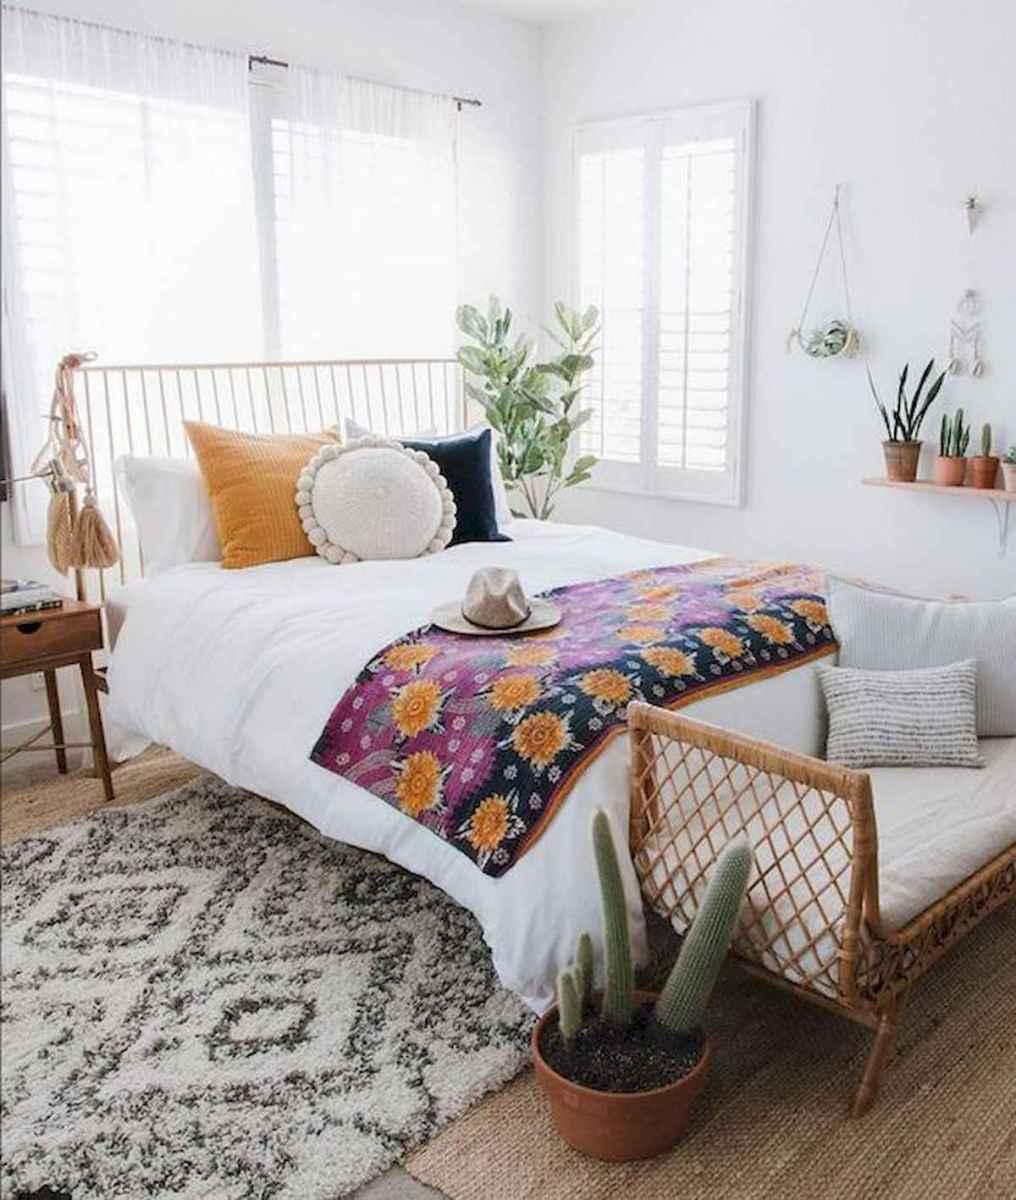 40 creative small apartment bedroom decor ideas (17)